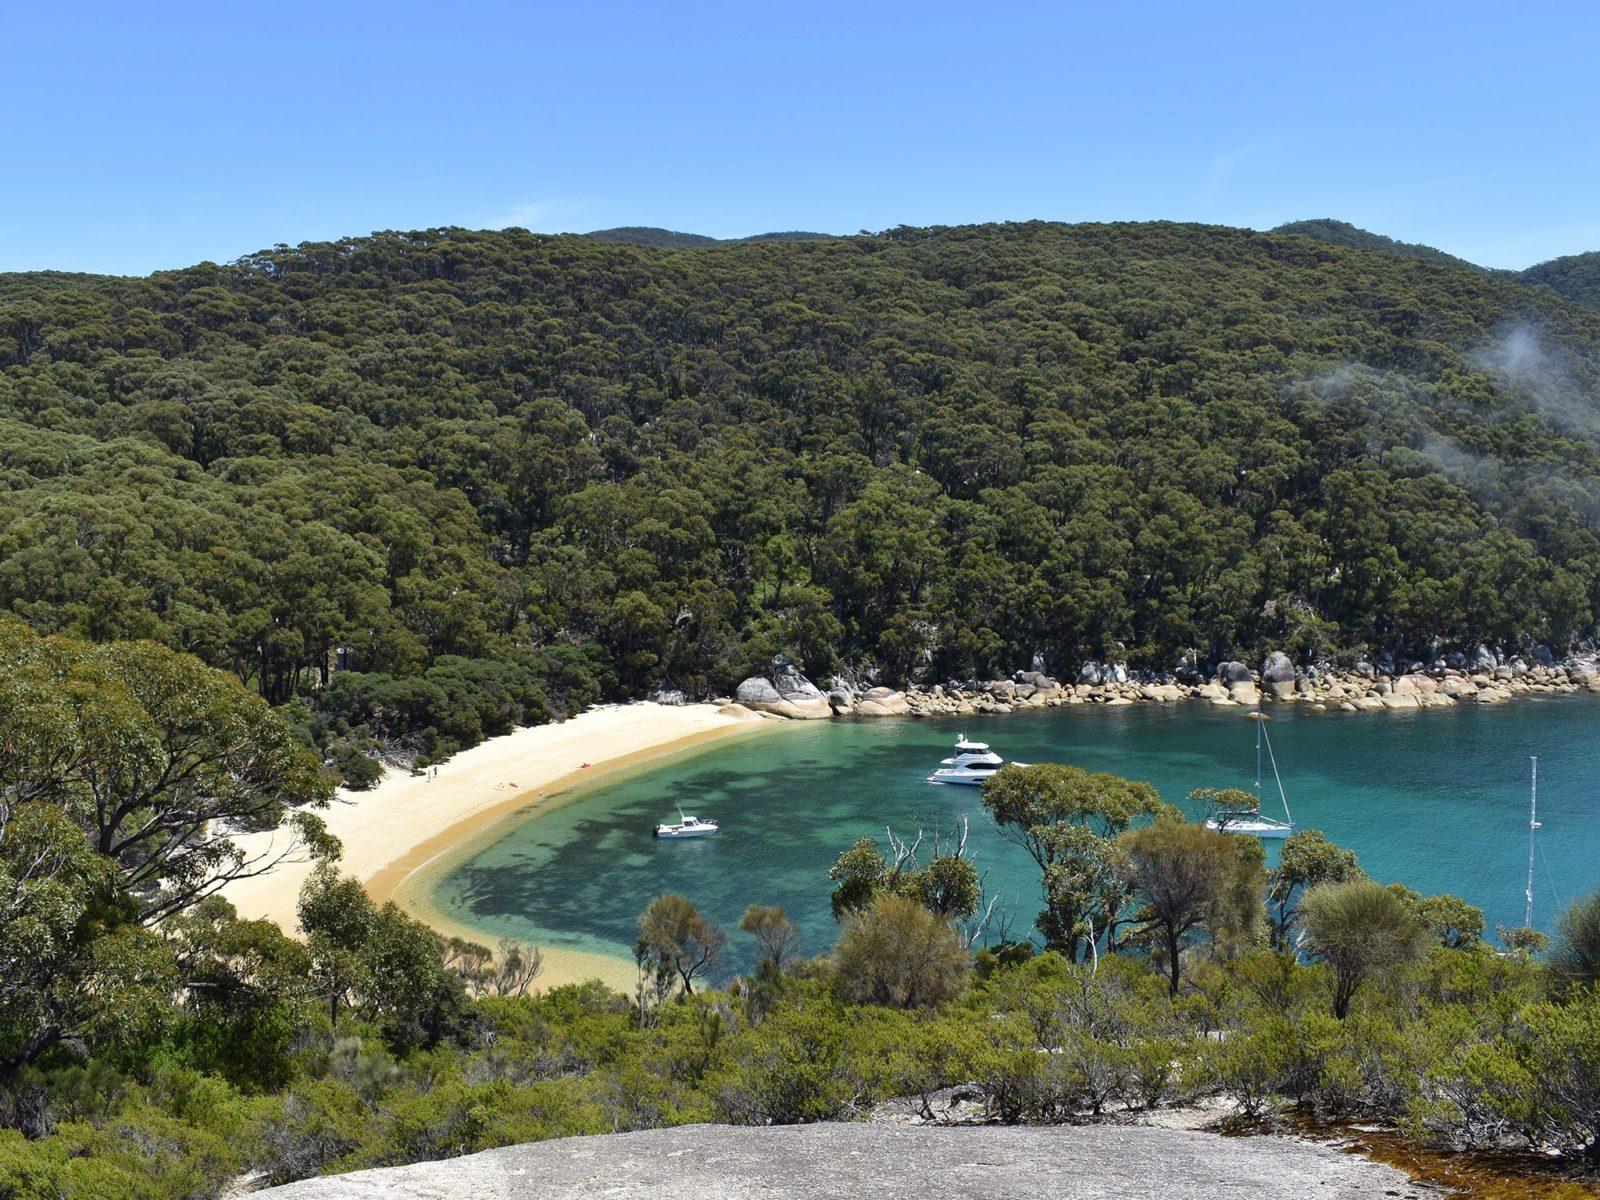 Refuge Cove Cruises